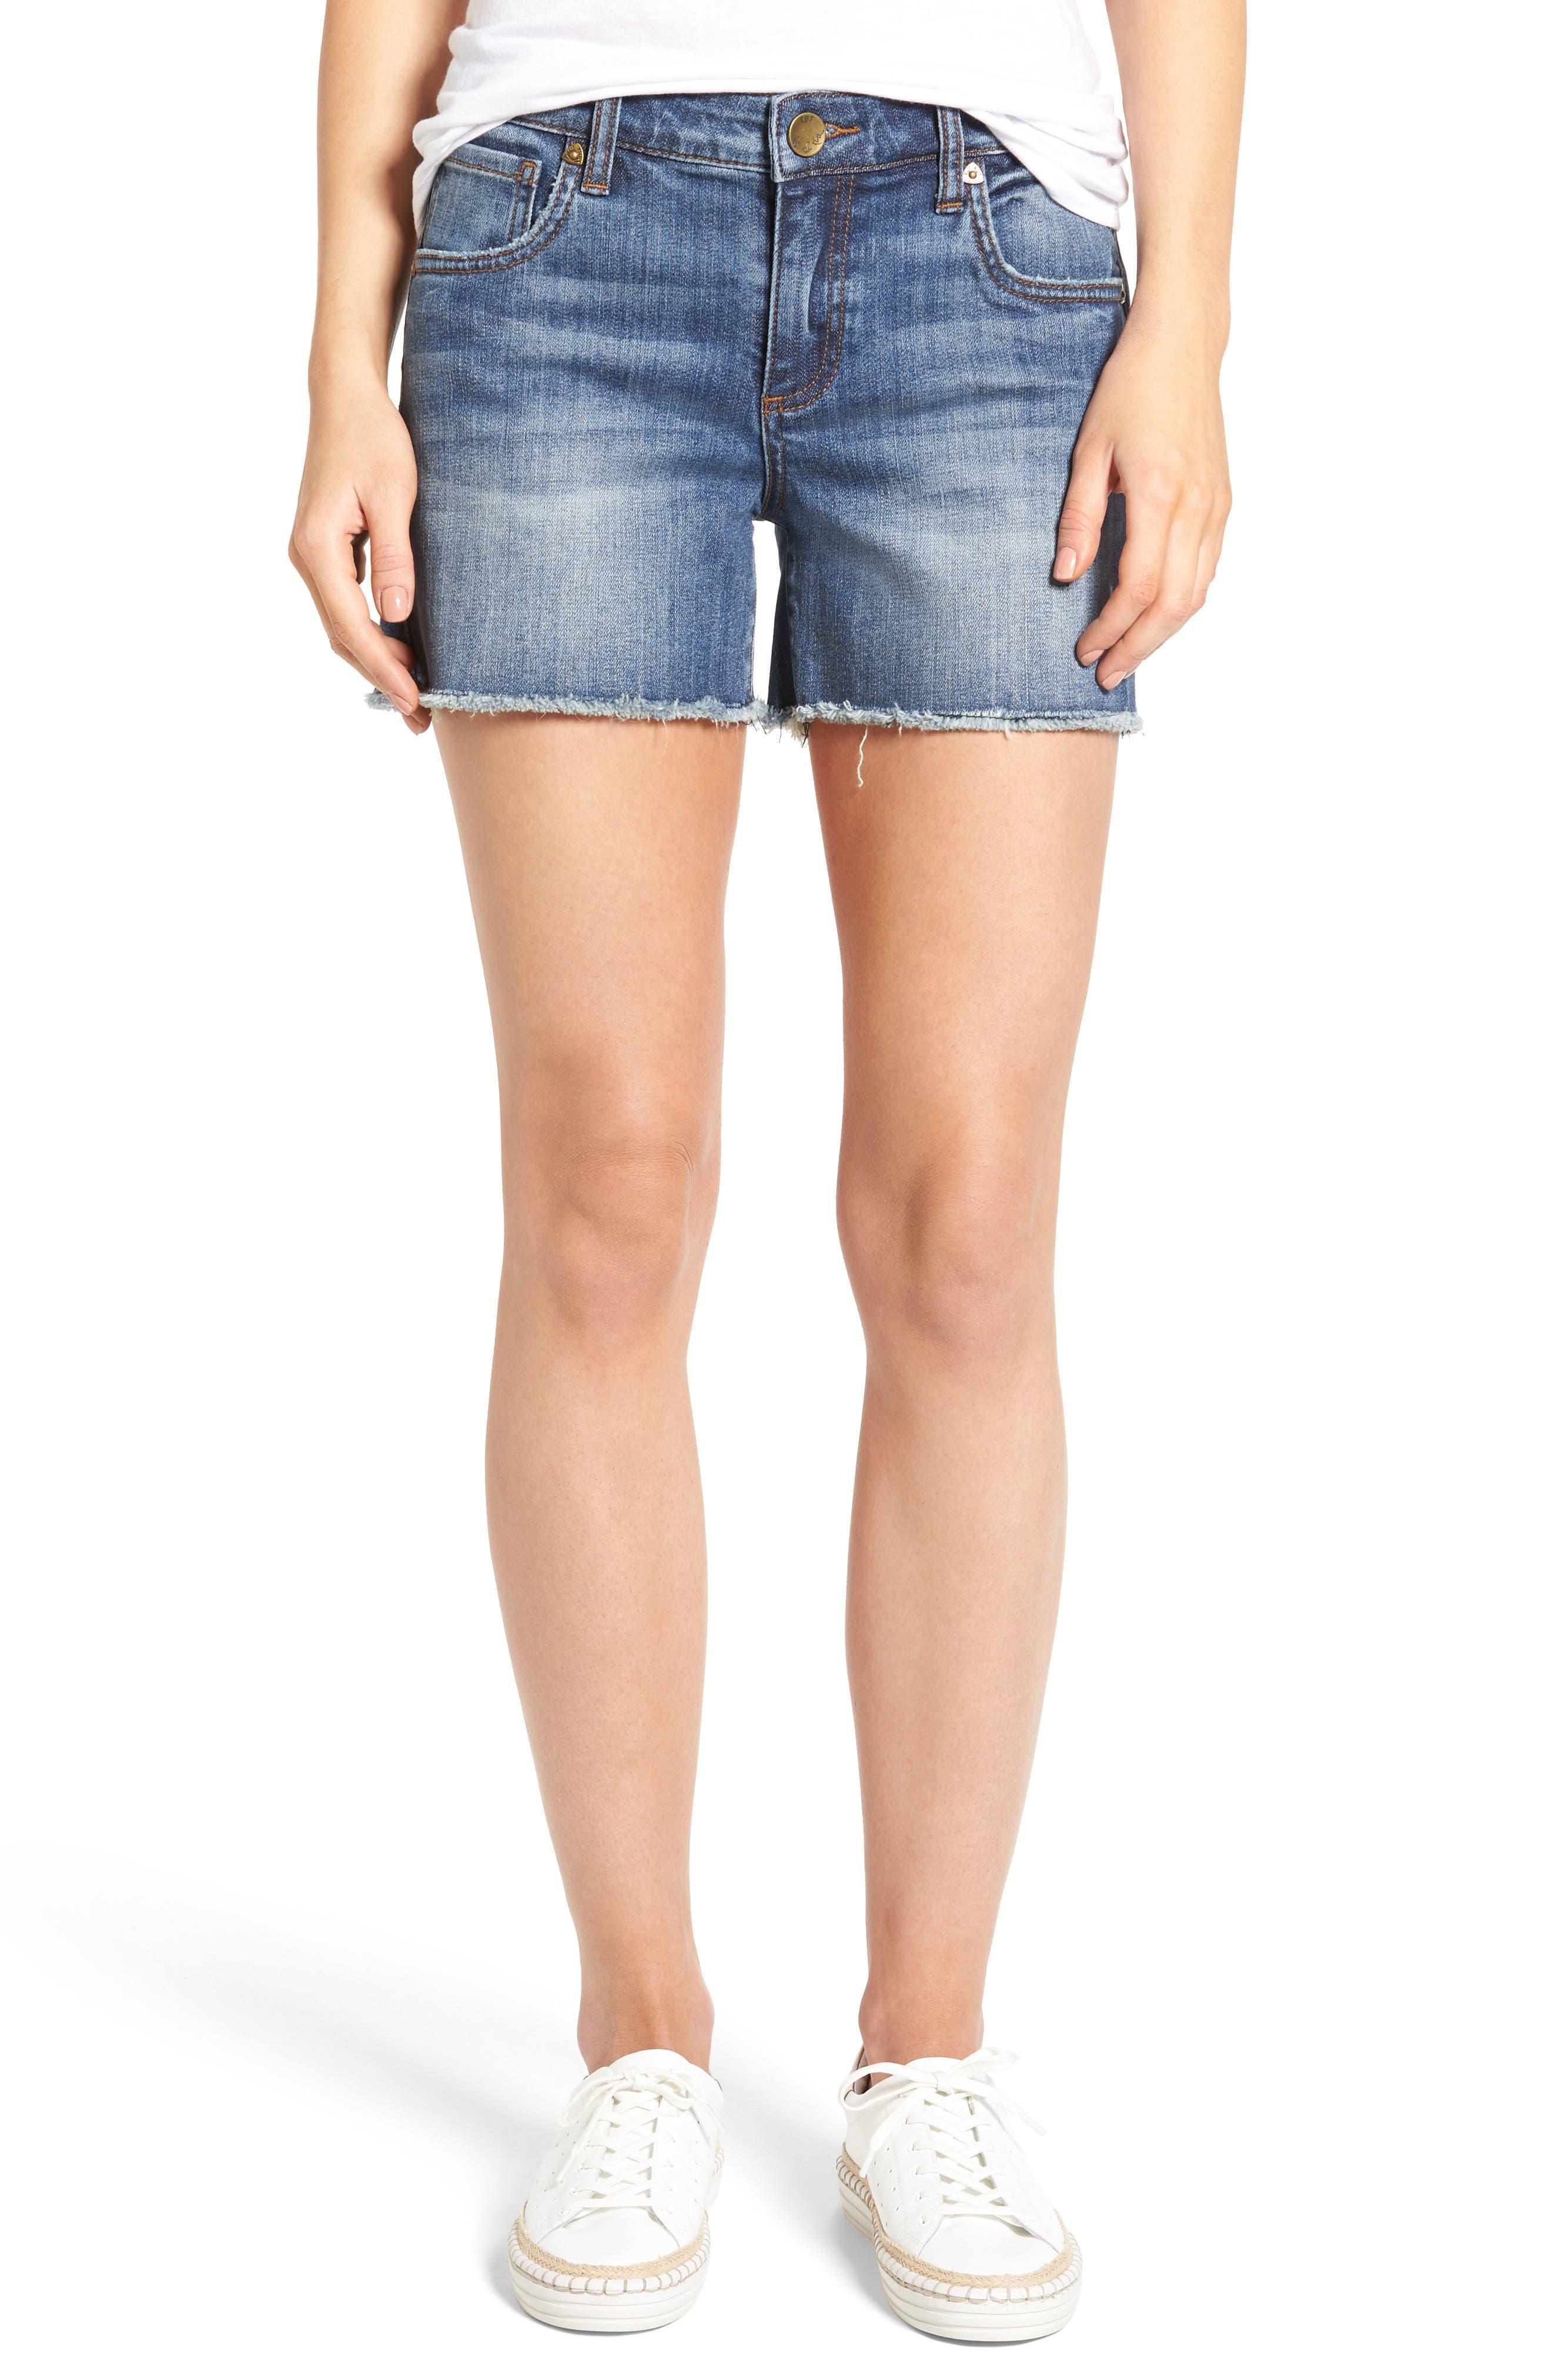 Gidget Denim Shorts,                         Main,                         color, CONSOLIDATED